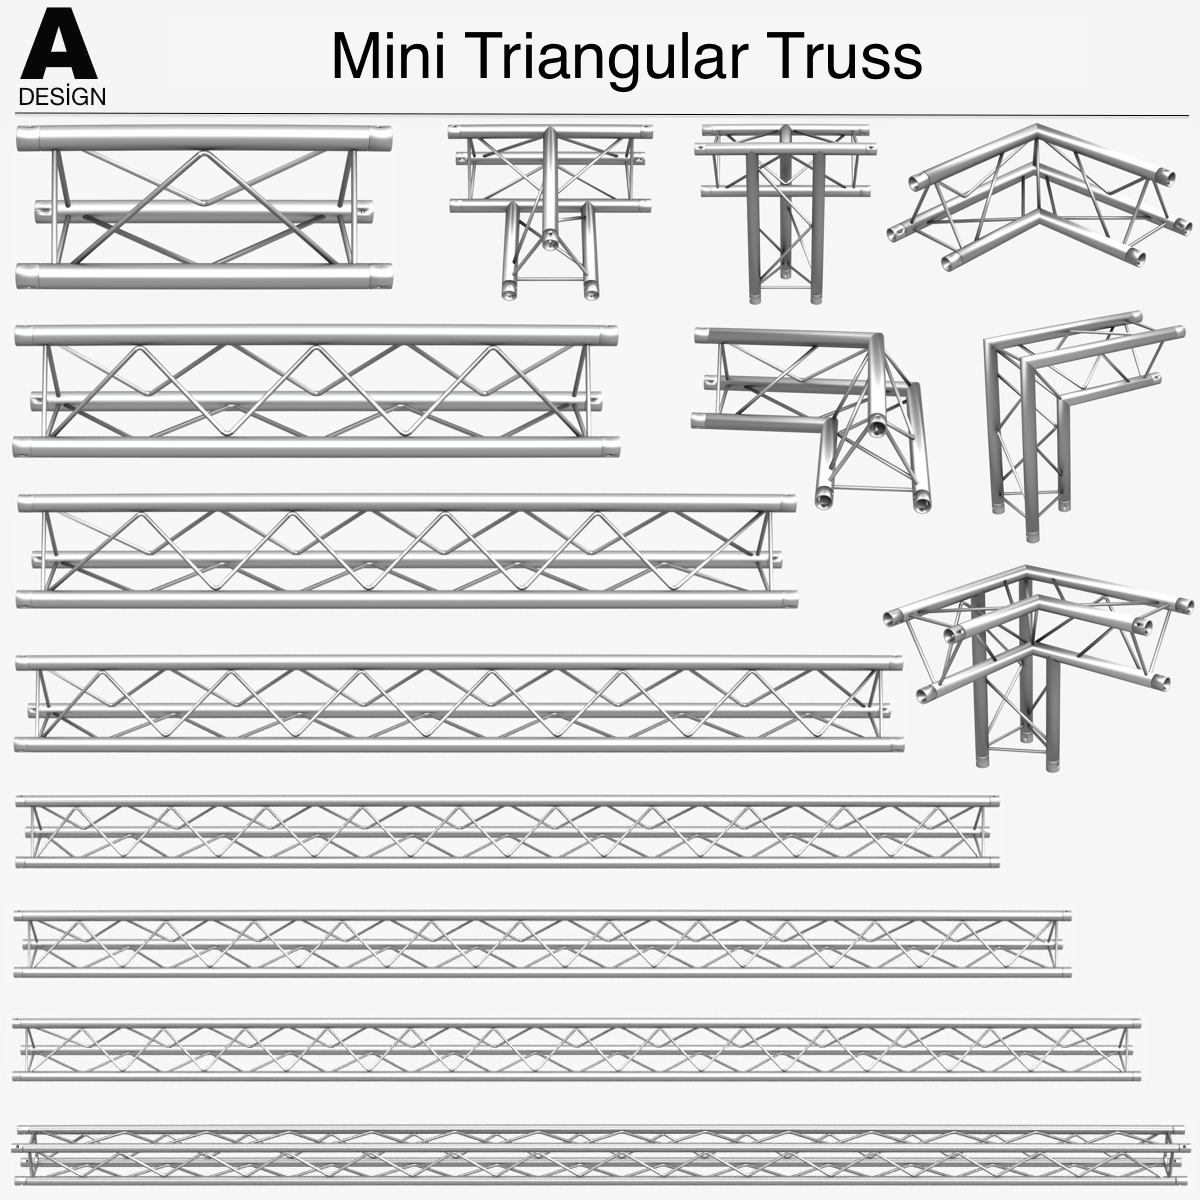 triangular trusses (collection 55 modular pieces) 3d model 3ds max dxf fbx c4d dae texture obj 216212